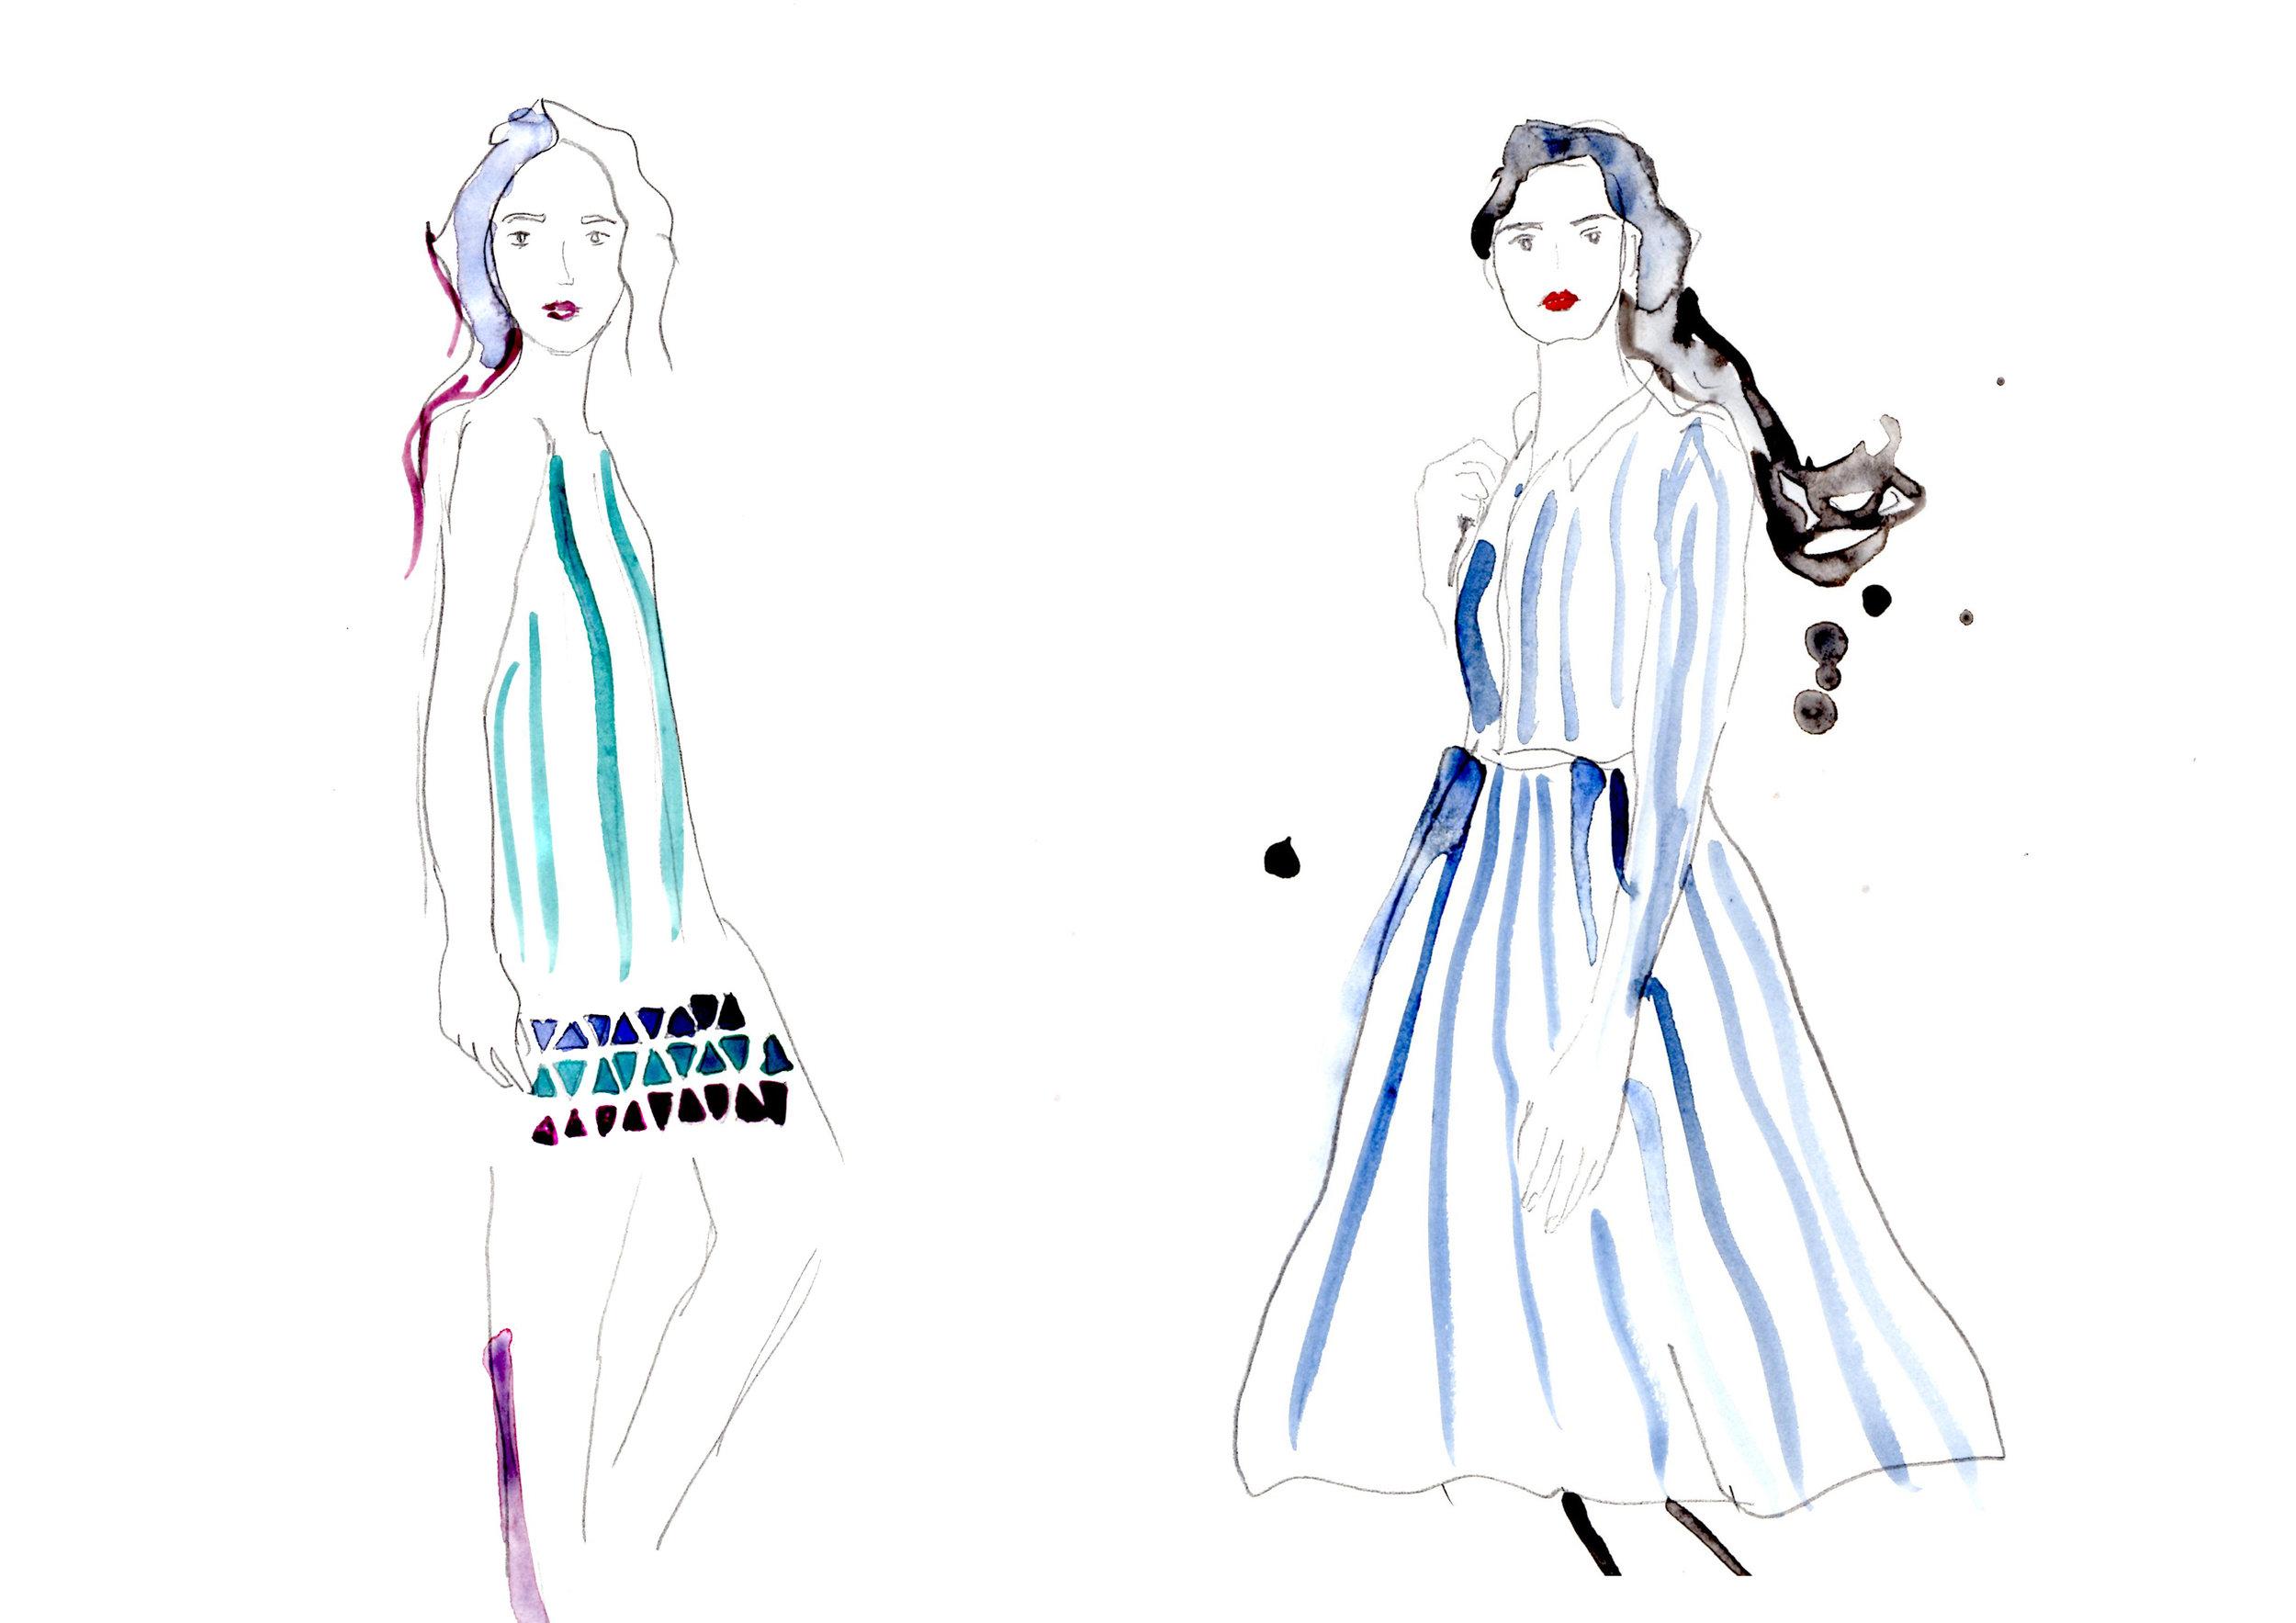 Micheele Urvall Nyren drawings.jpg